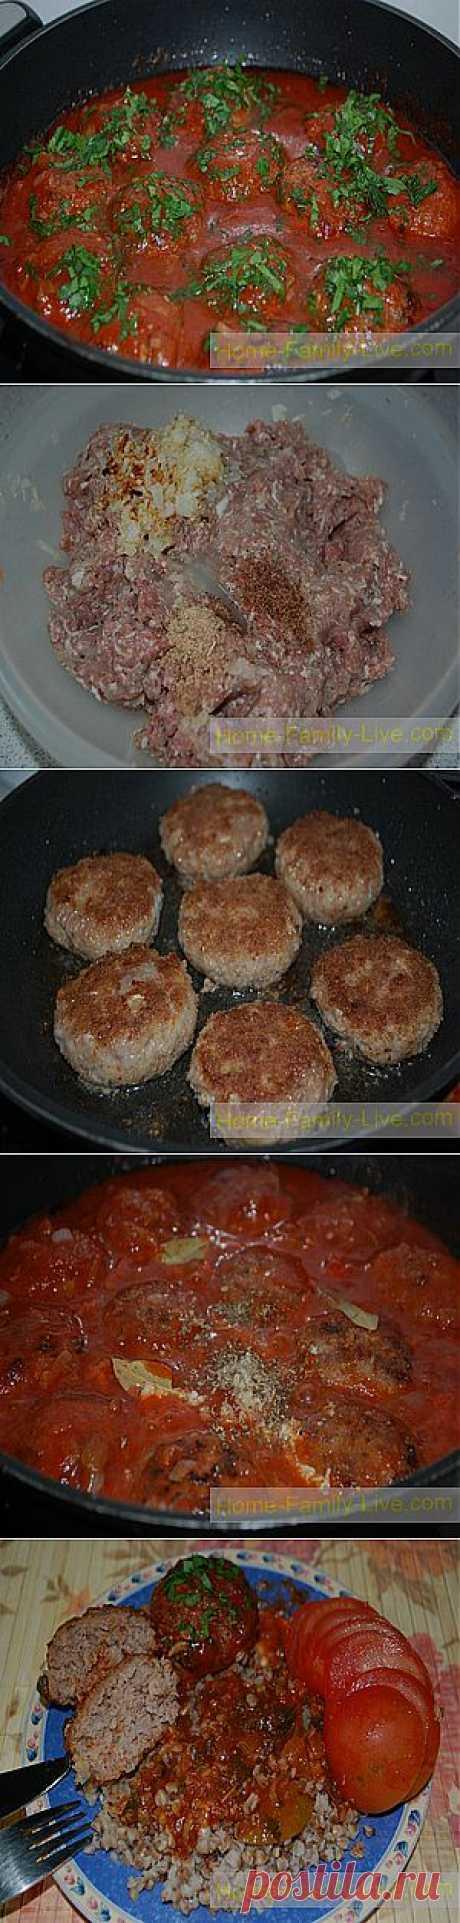 Кулинарные рецепты Котлеты в соусе » Кулинарные рецепты